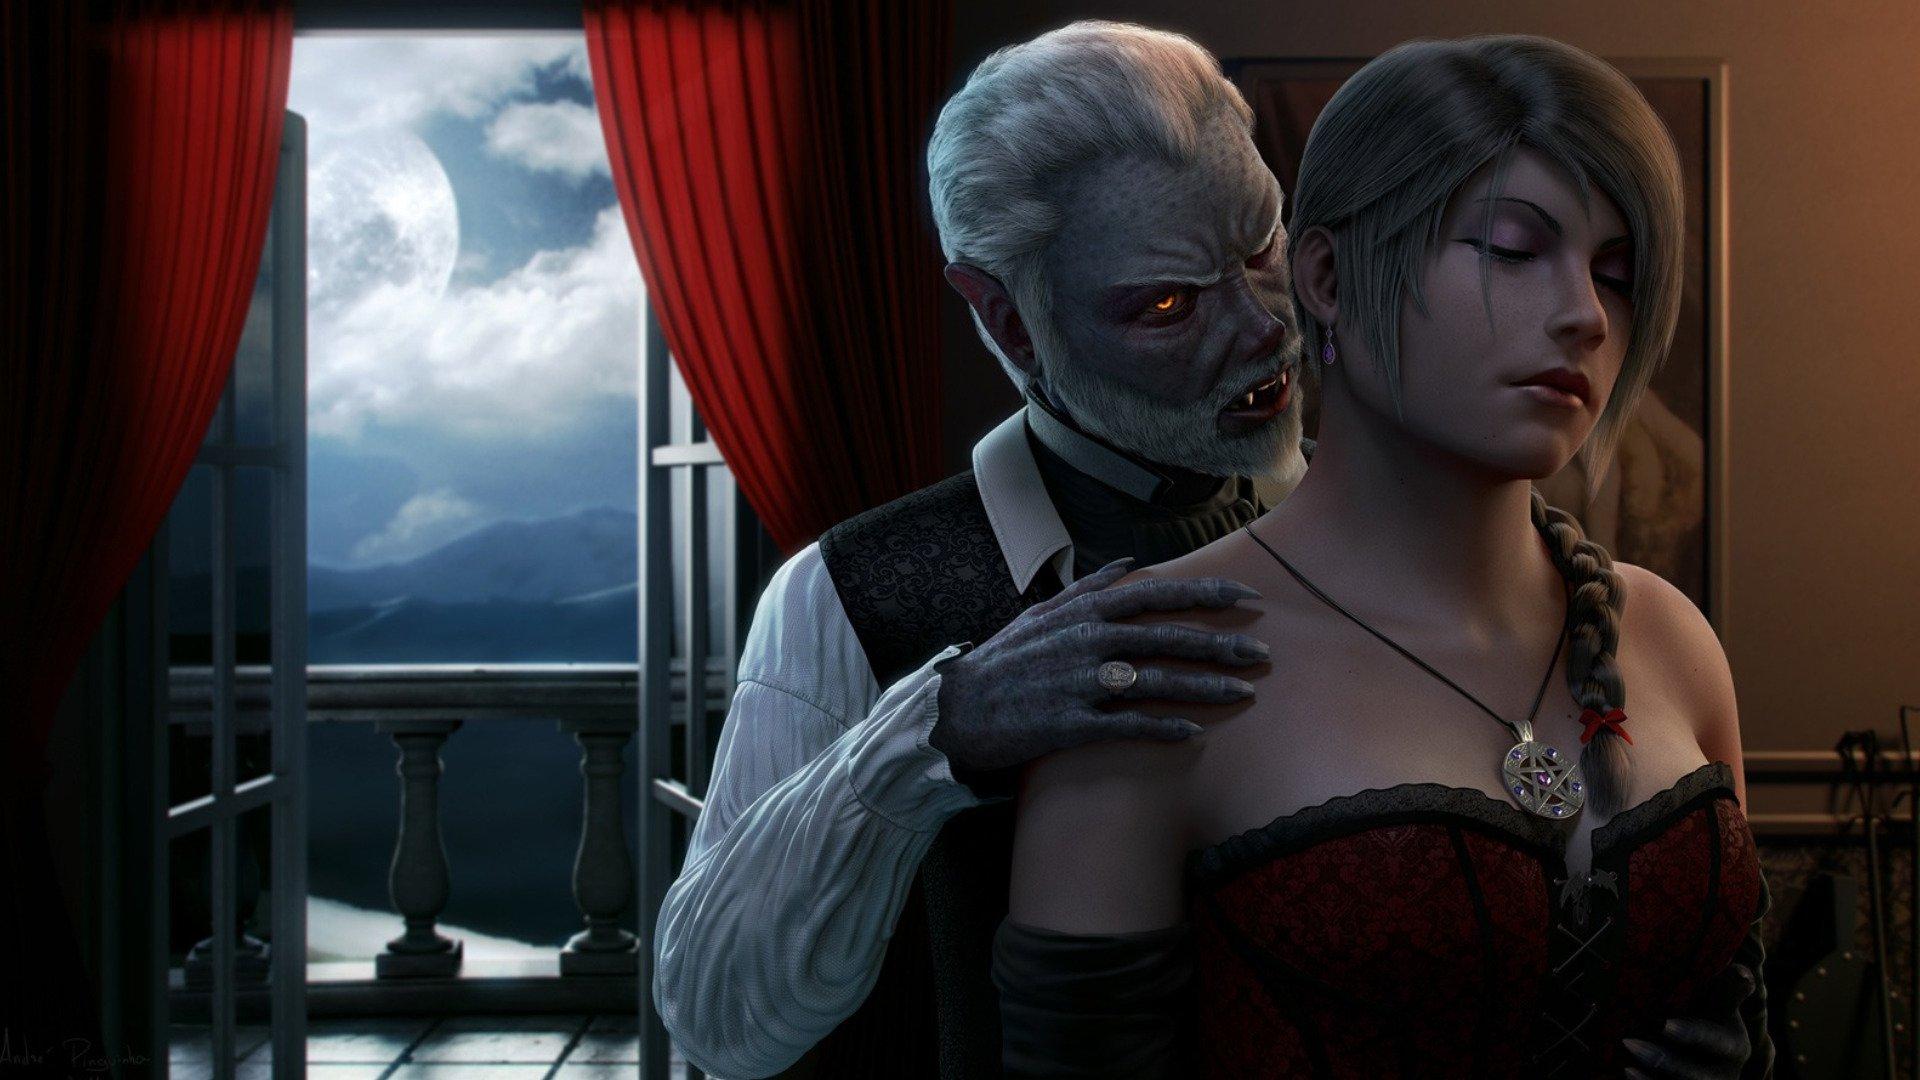 Vampire The Masquerade Bloodlines 1920x1080: Vampire HD Wallpaper